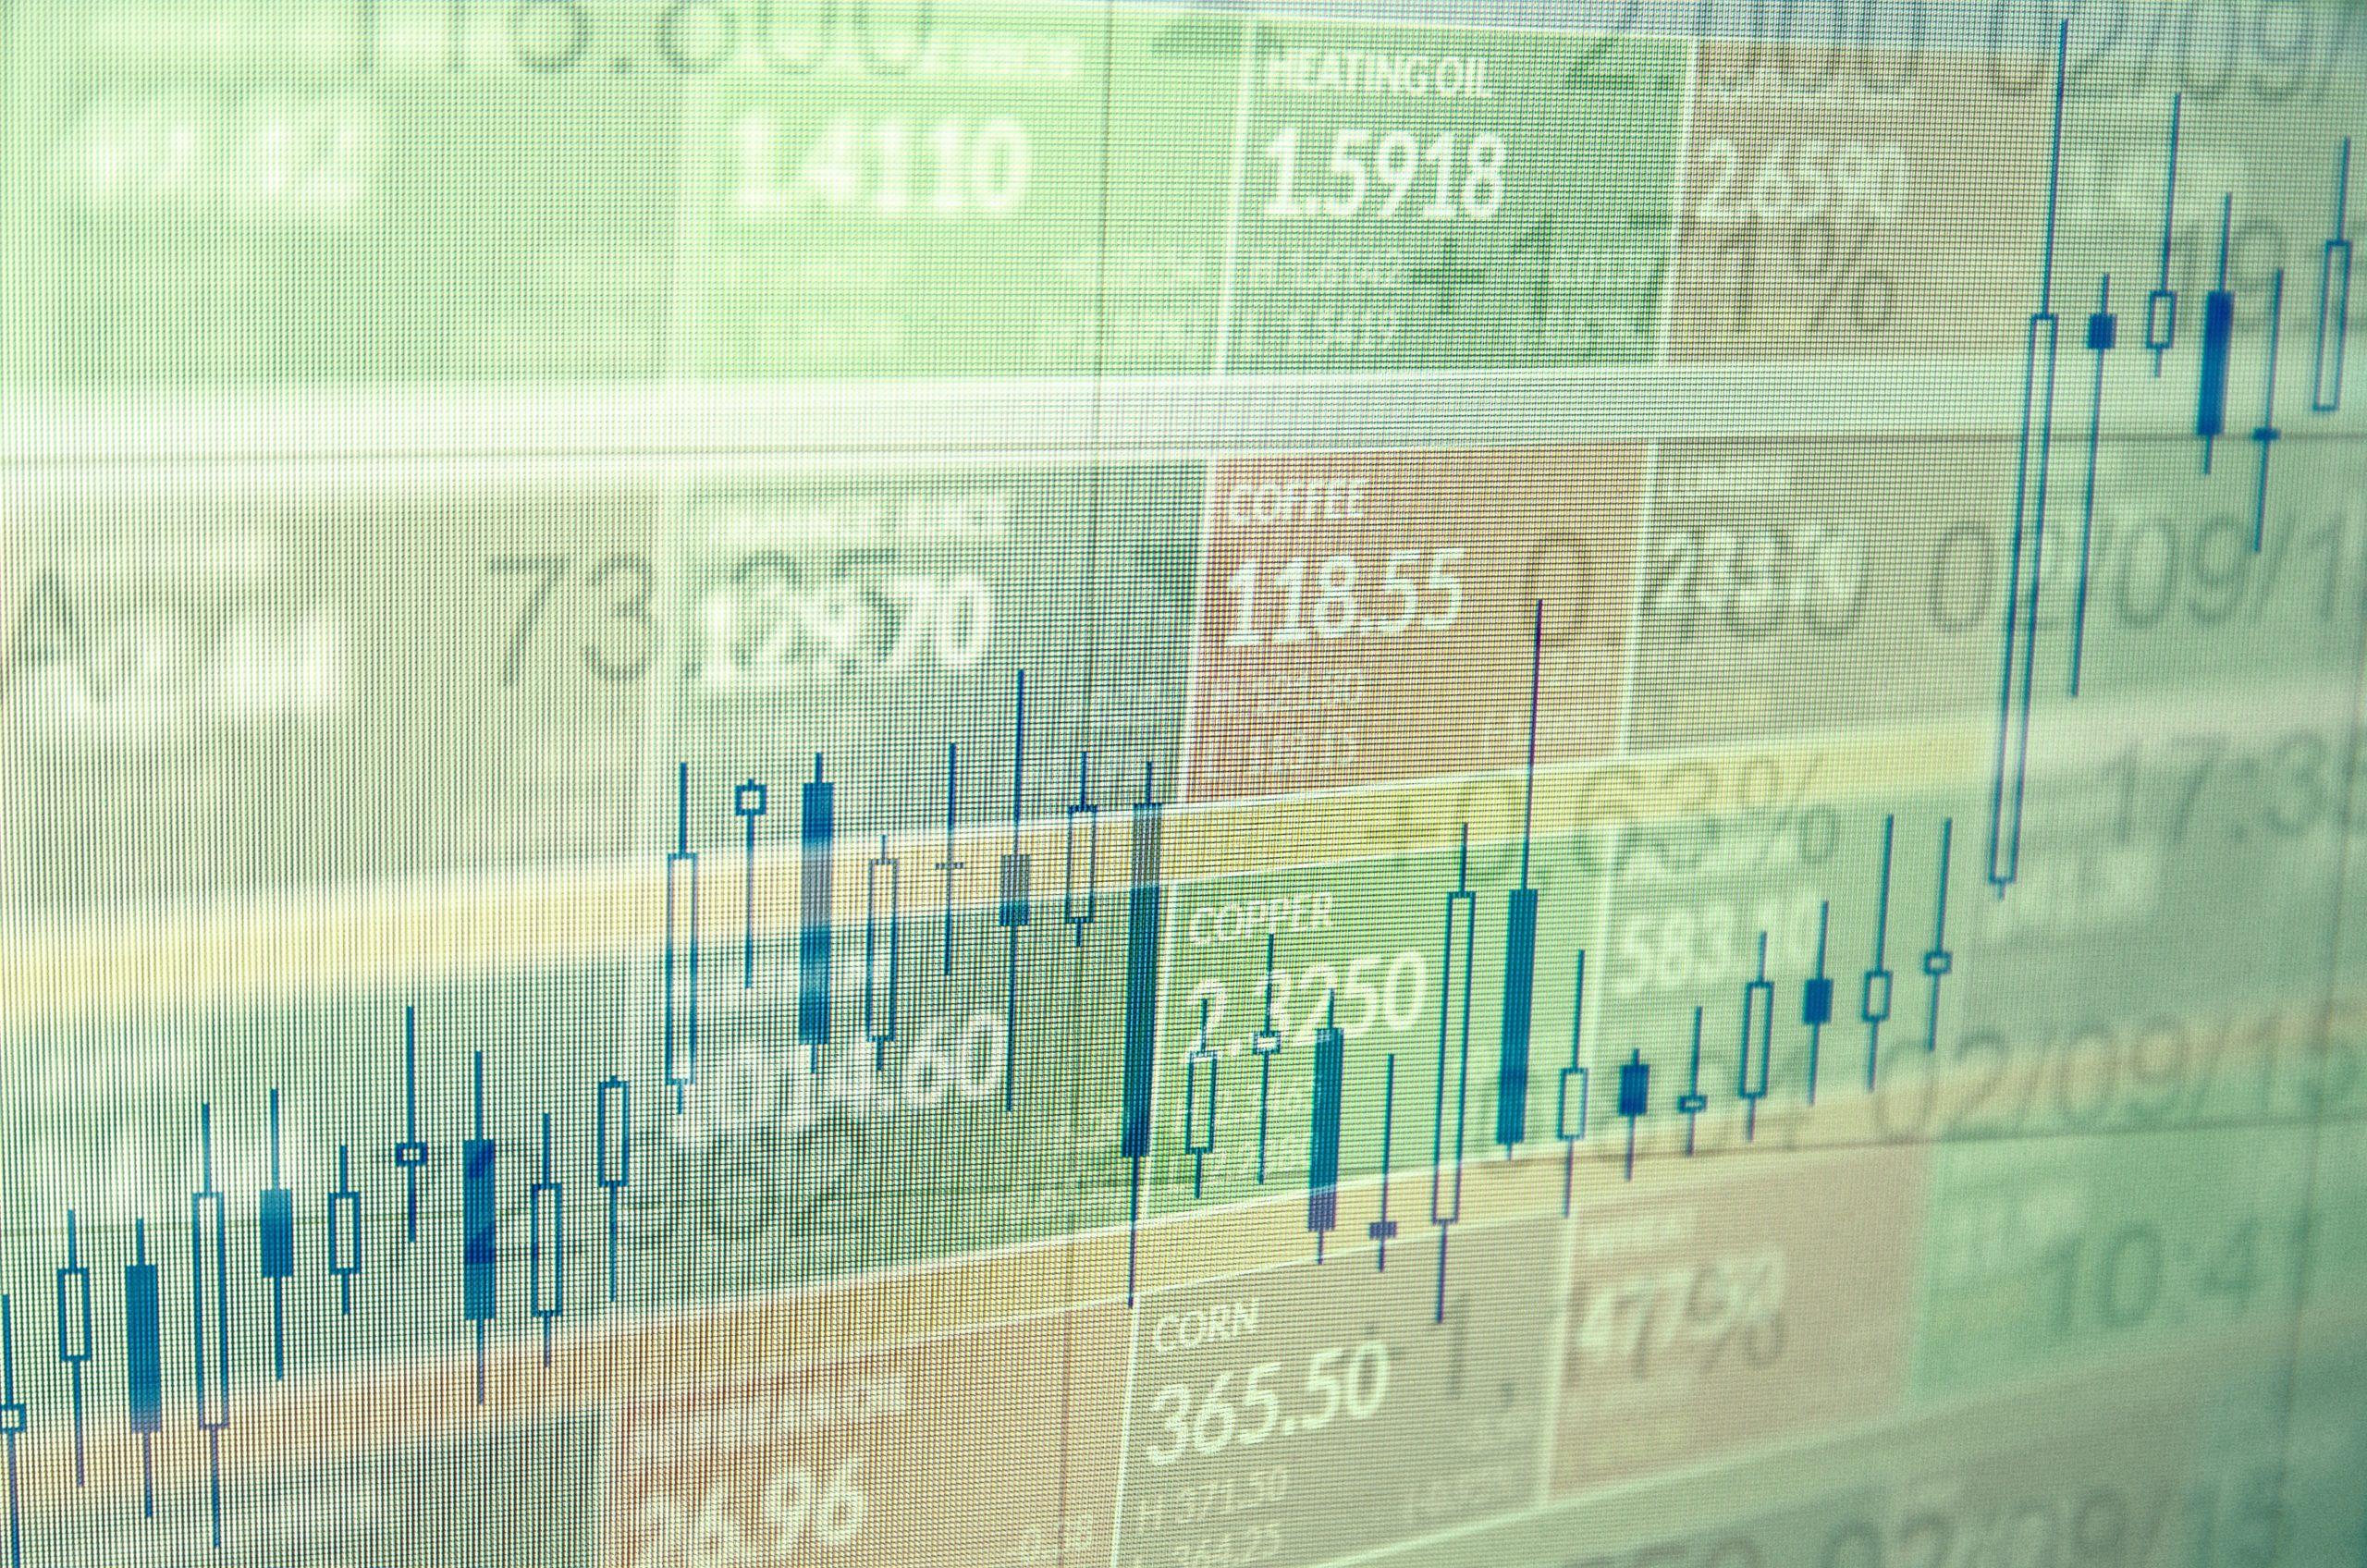 'Astonishing' growth in green capital markets